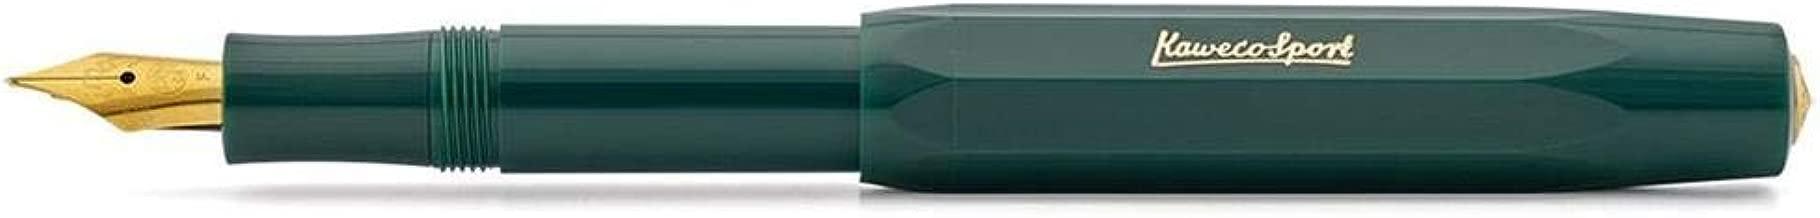 Kaweco Sport Classic Fountainpen green M (medium)